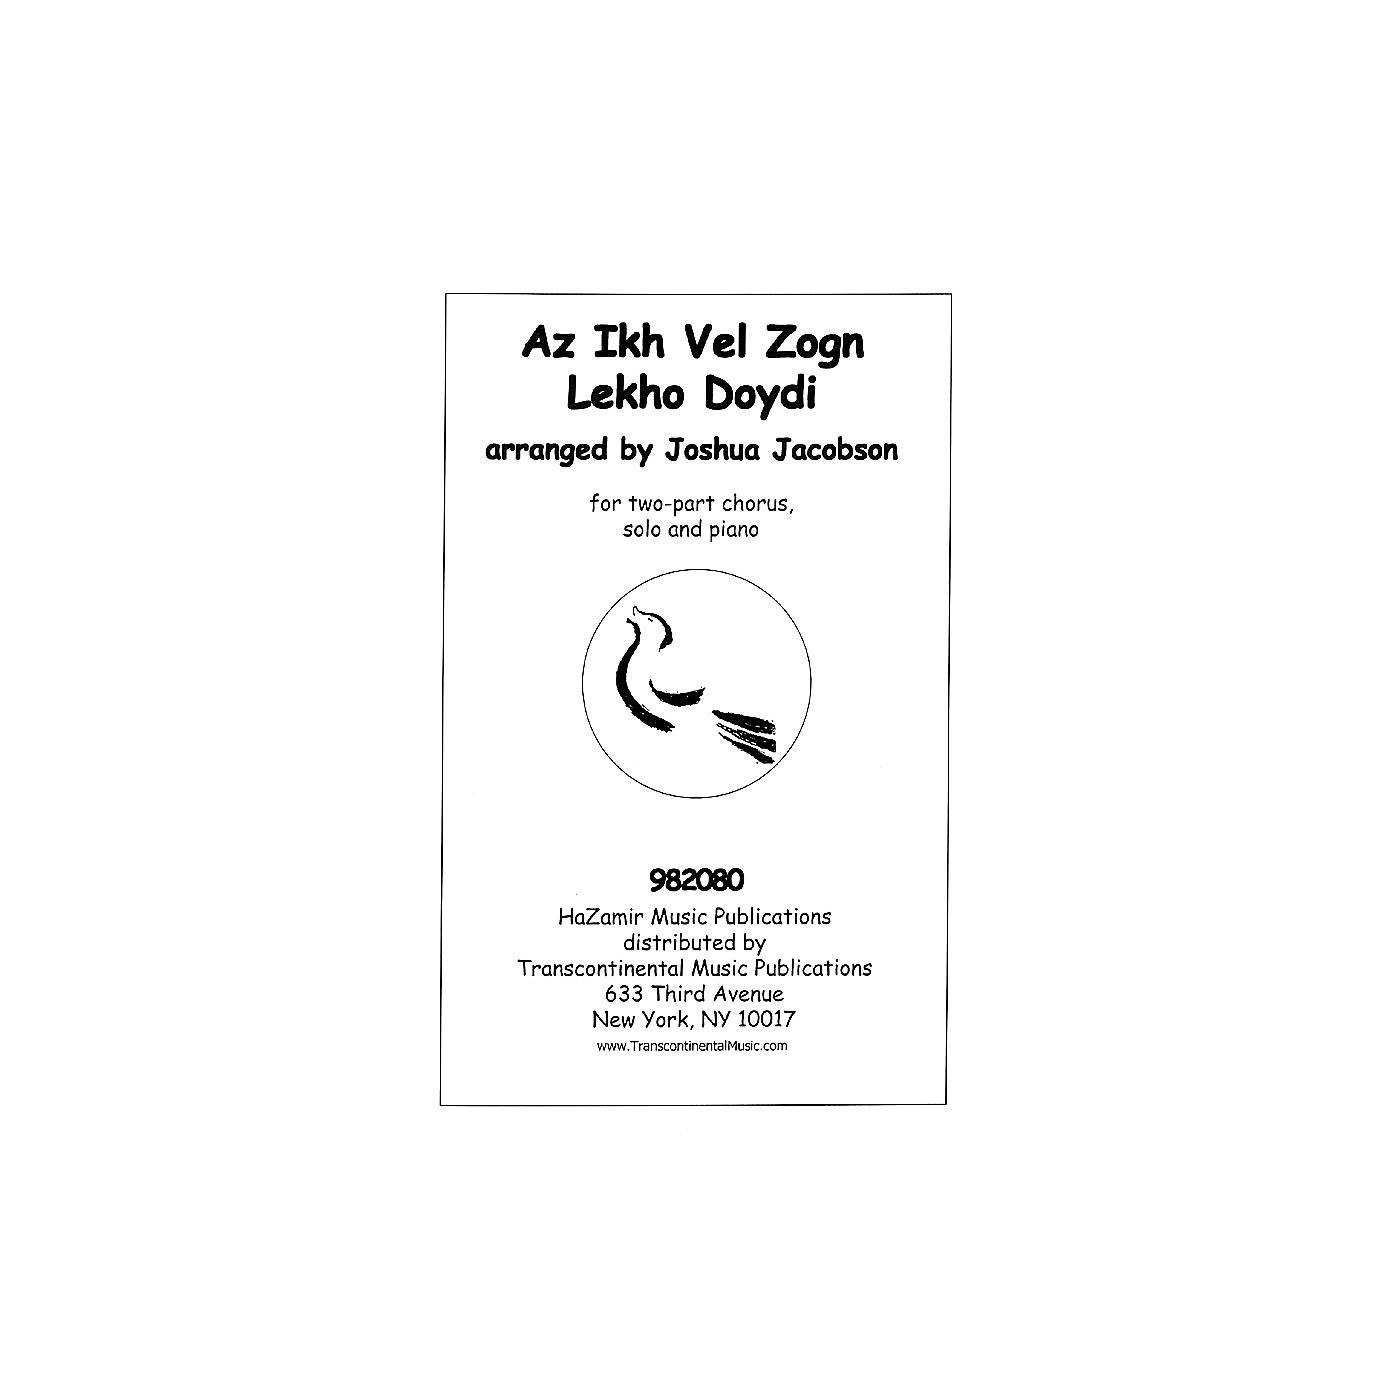 Transcontinental Music Az Ikh Vel Zogn Lekho Doydi SA arranged by Joshua Jacobson thumbnail